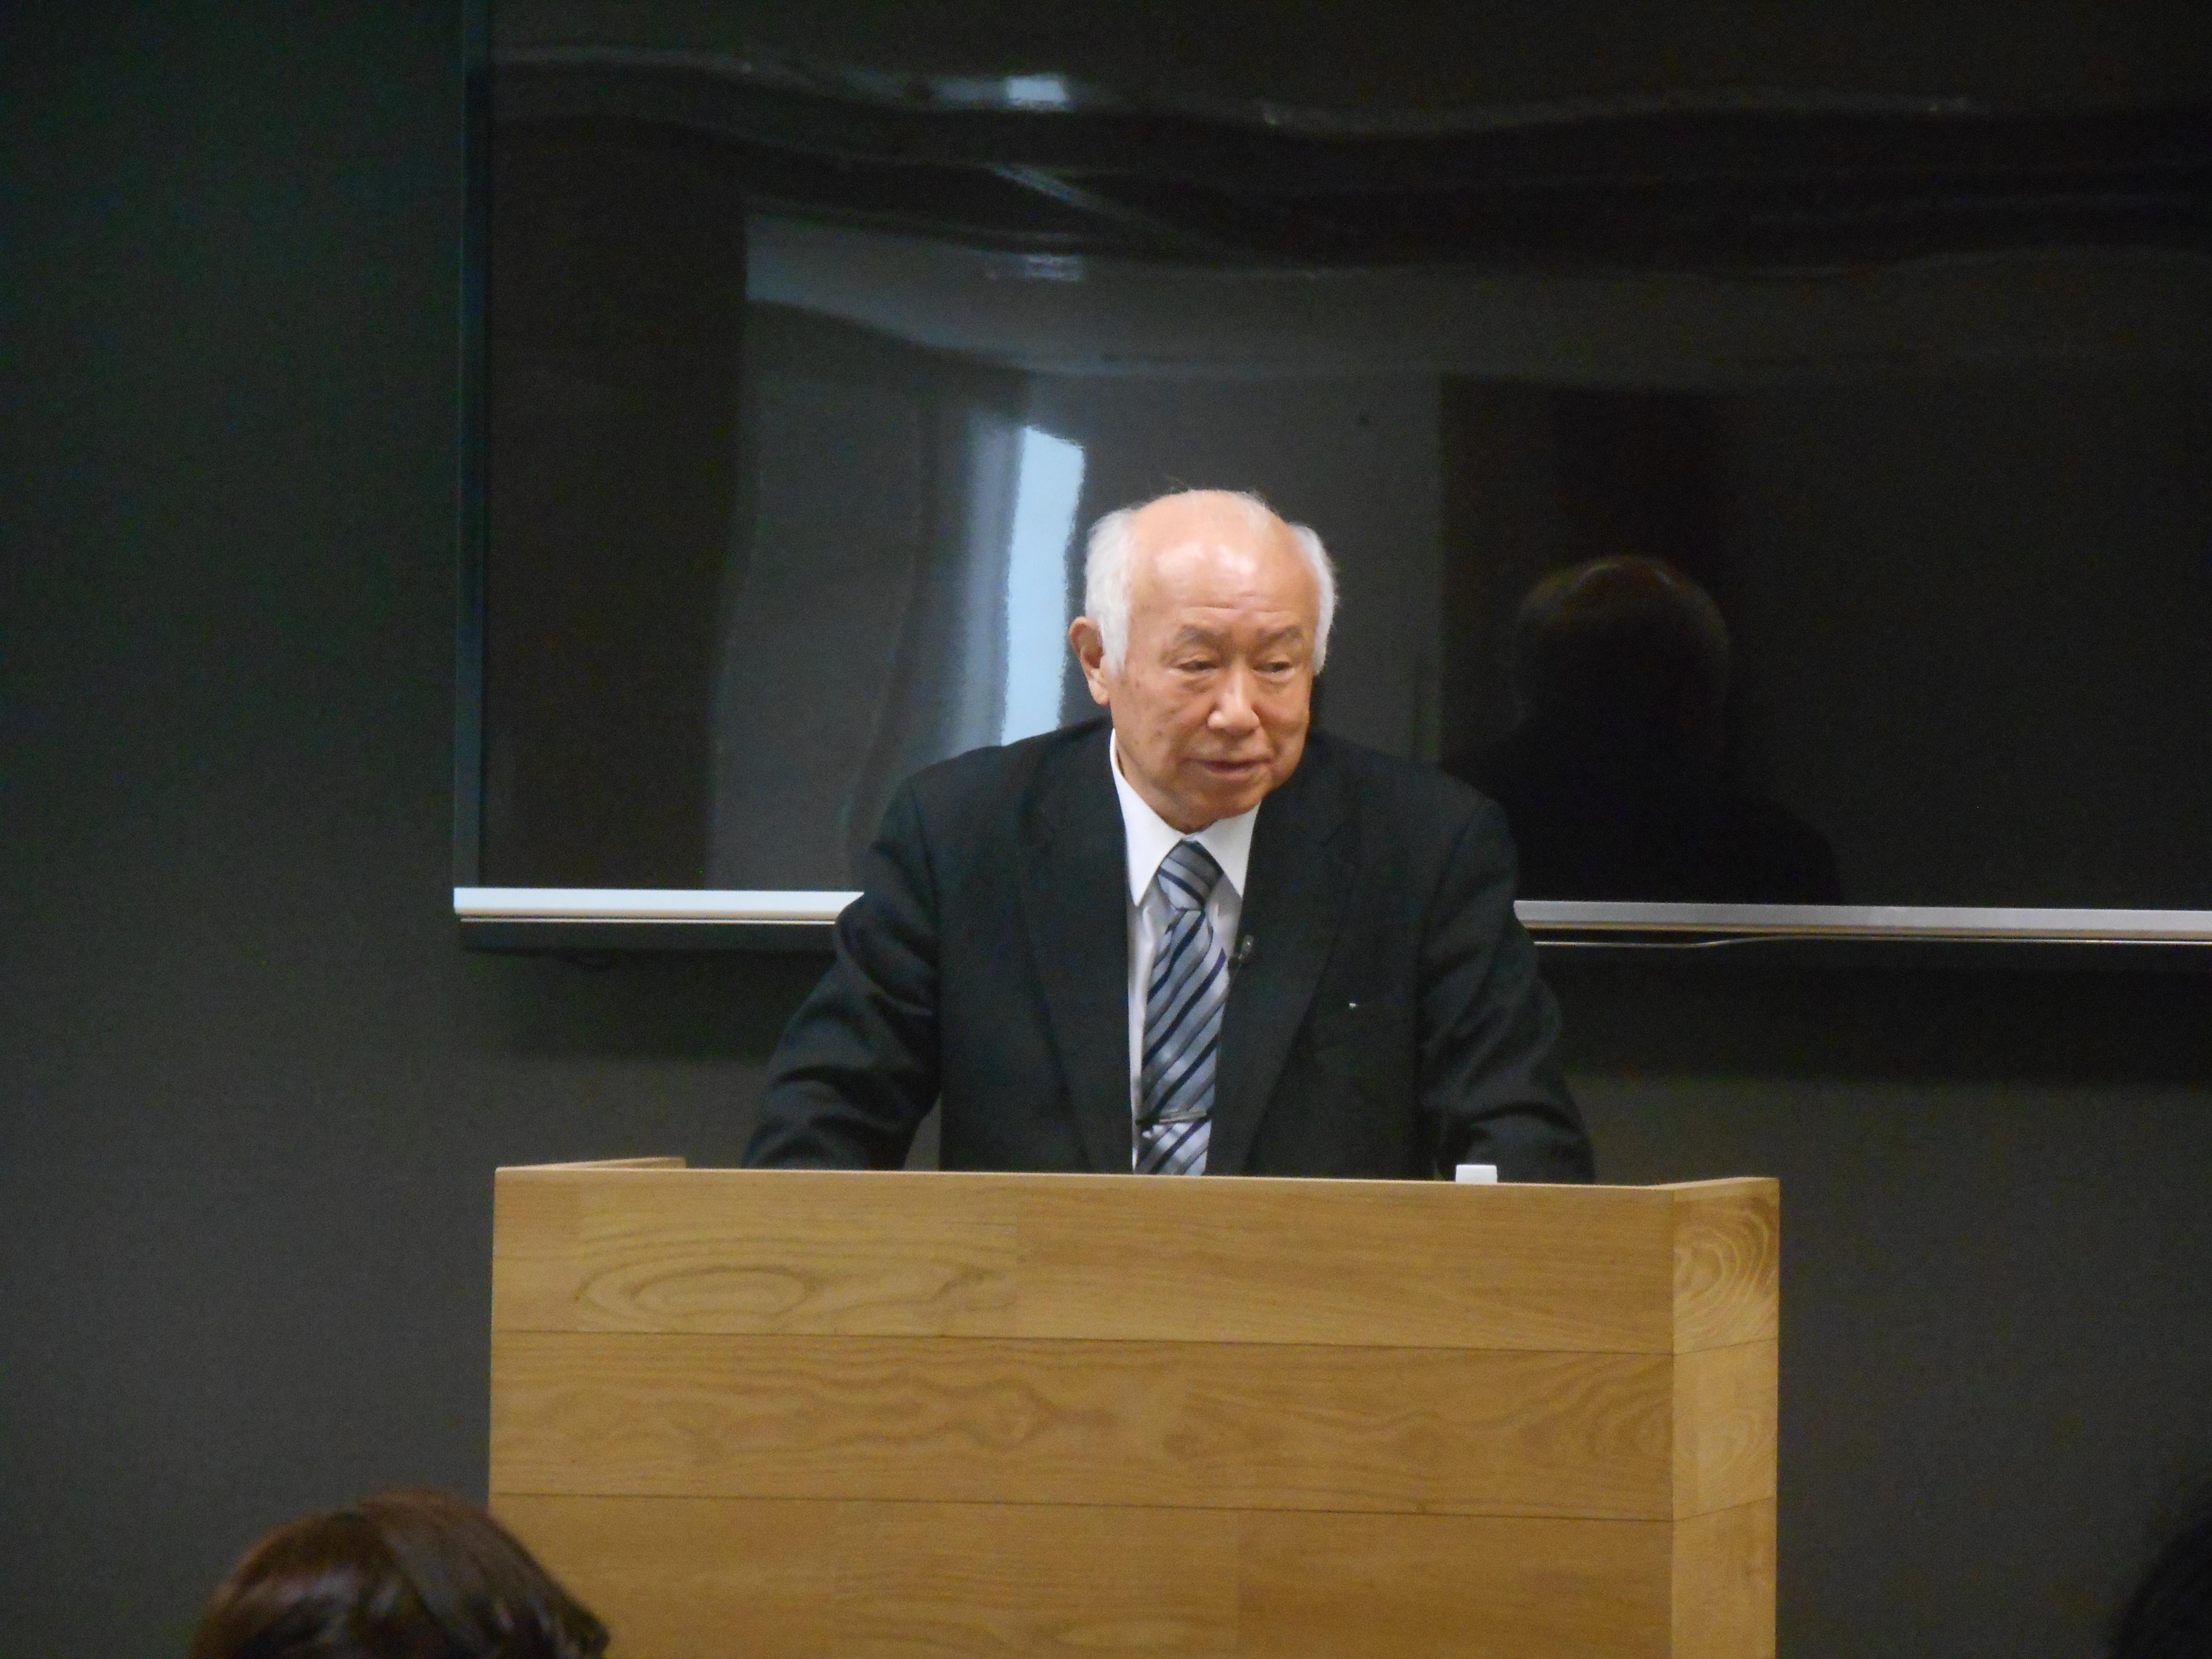 DSCN0422 - 4月1日東京思風塾の開催になります。